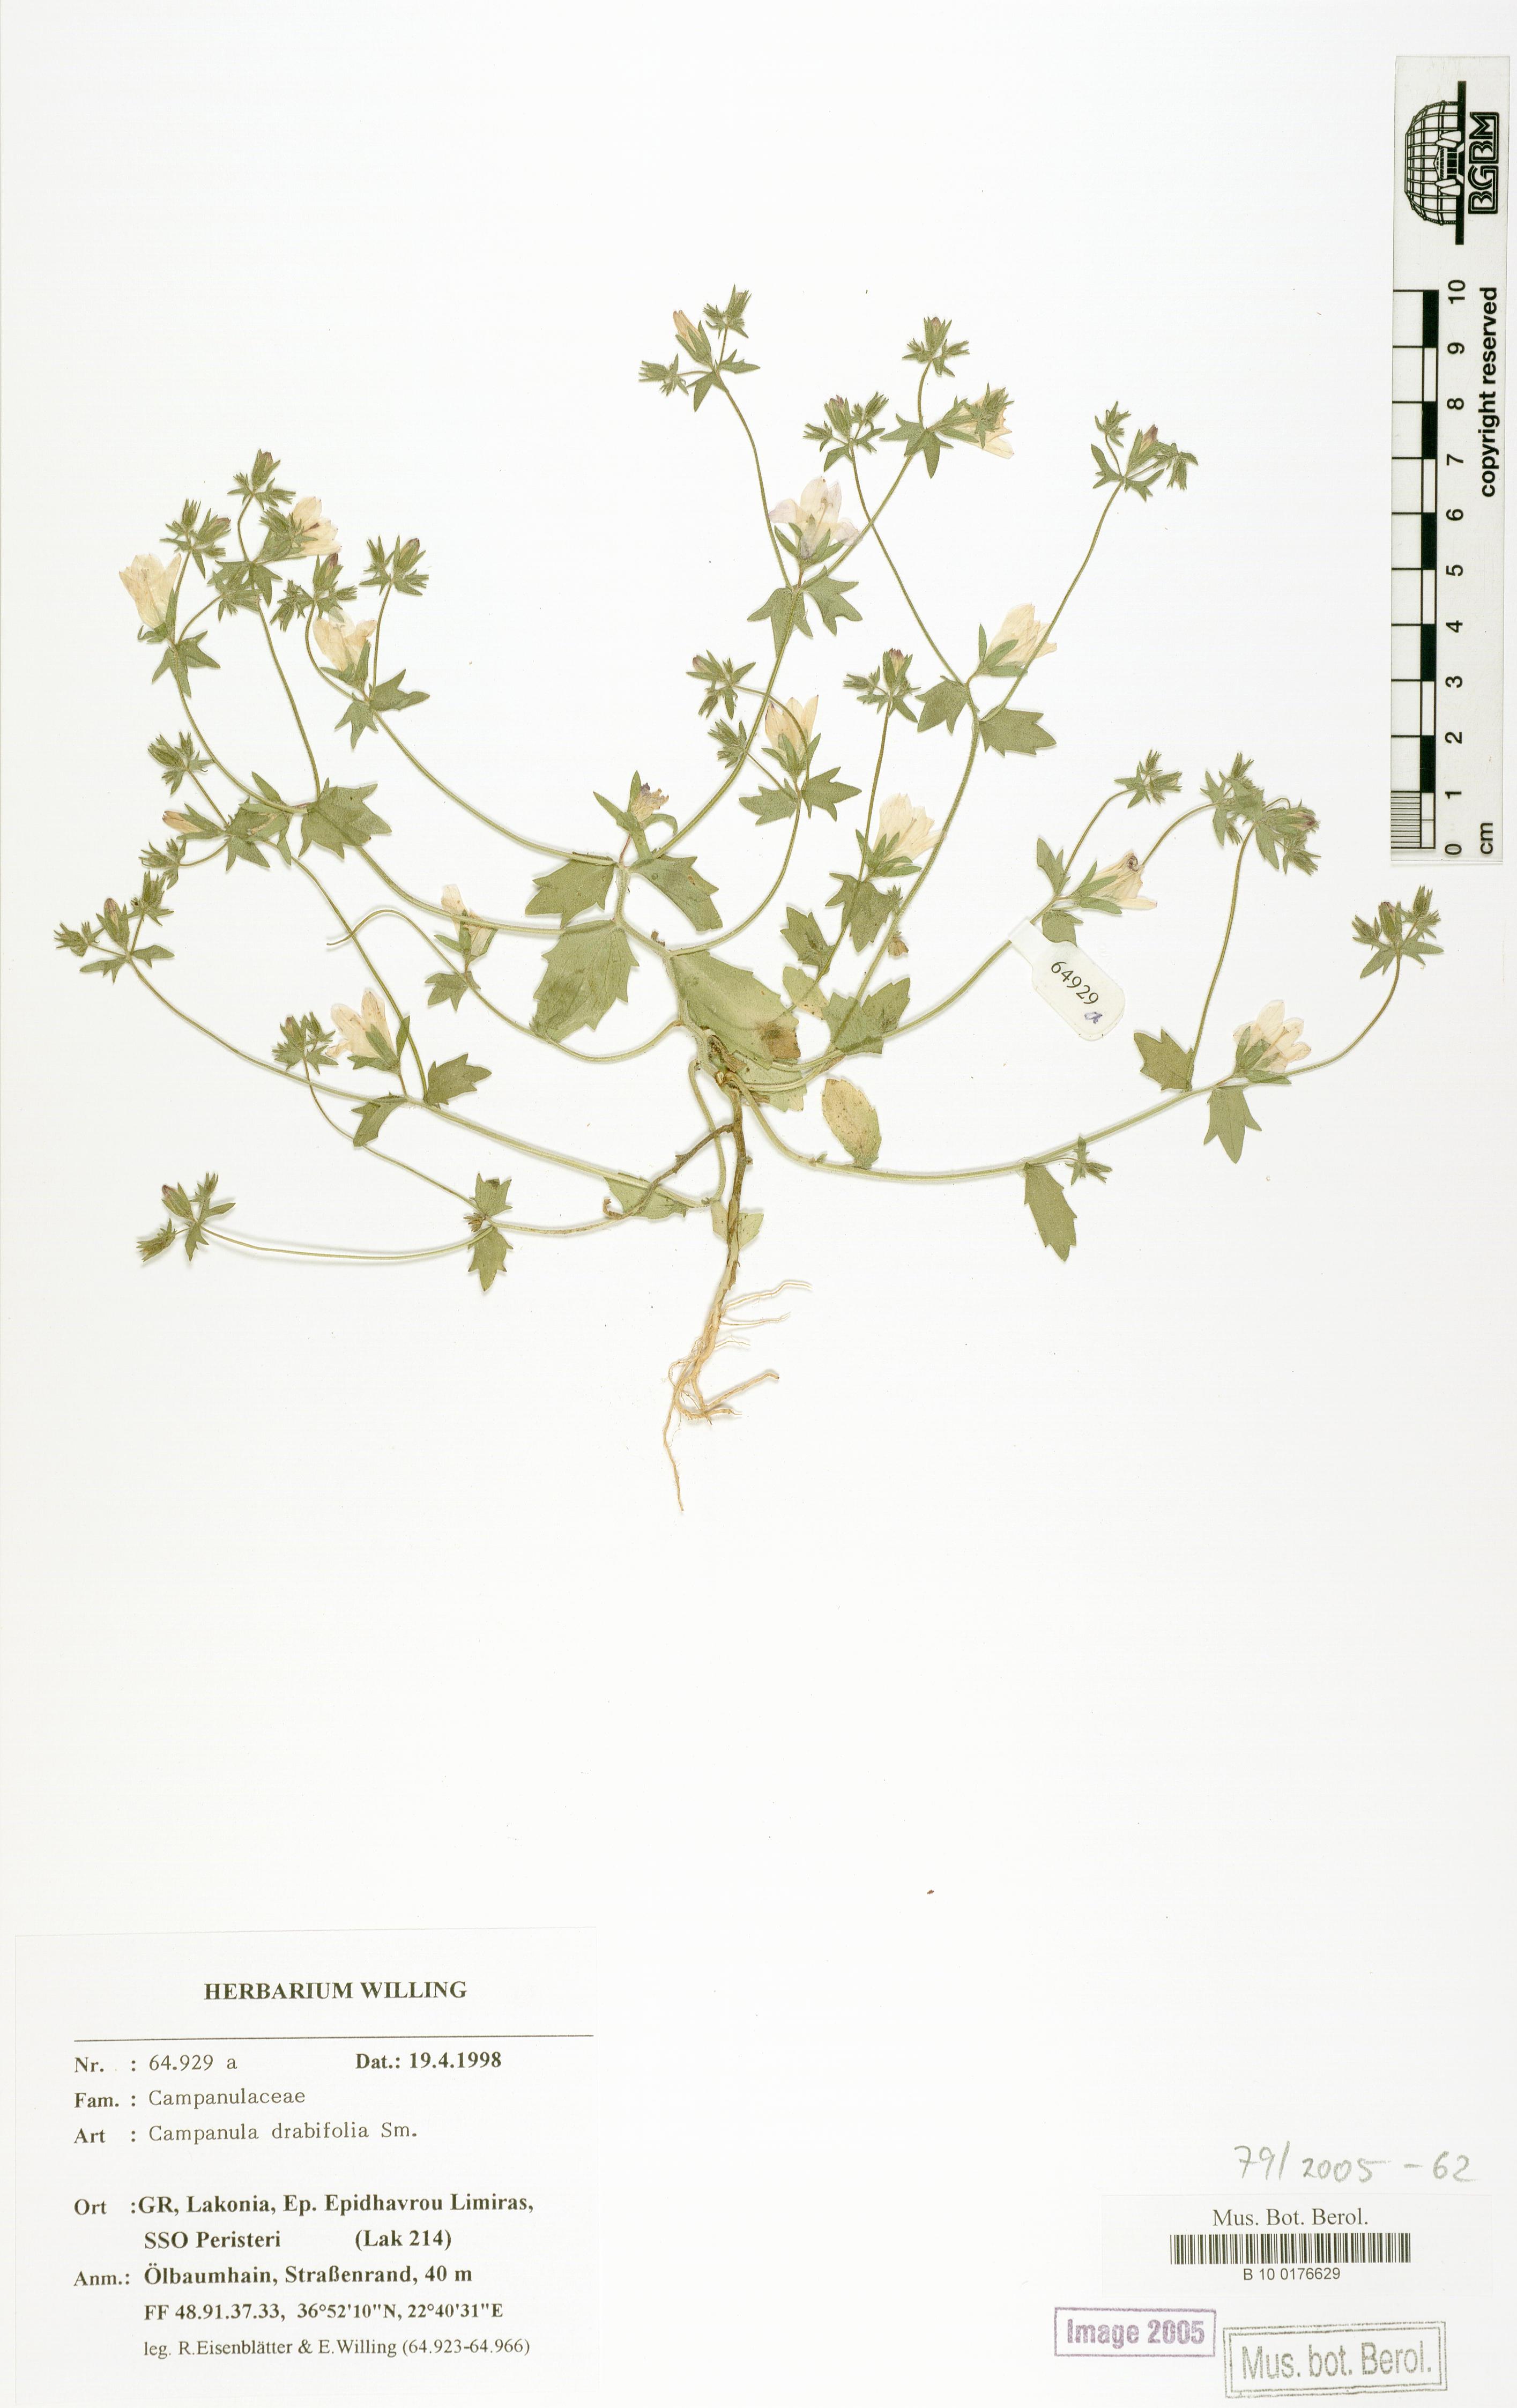 http://ww2.bgbm.org/herbarium/images/B/10/01/76/62/B_10_0176629.jpg